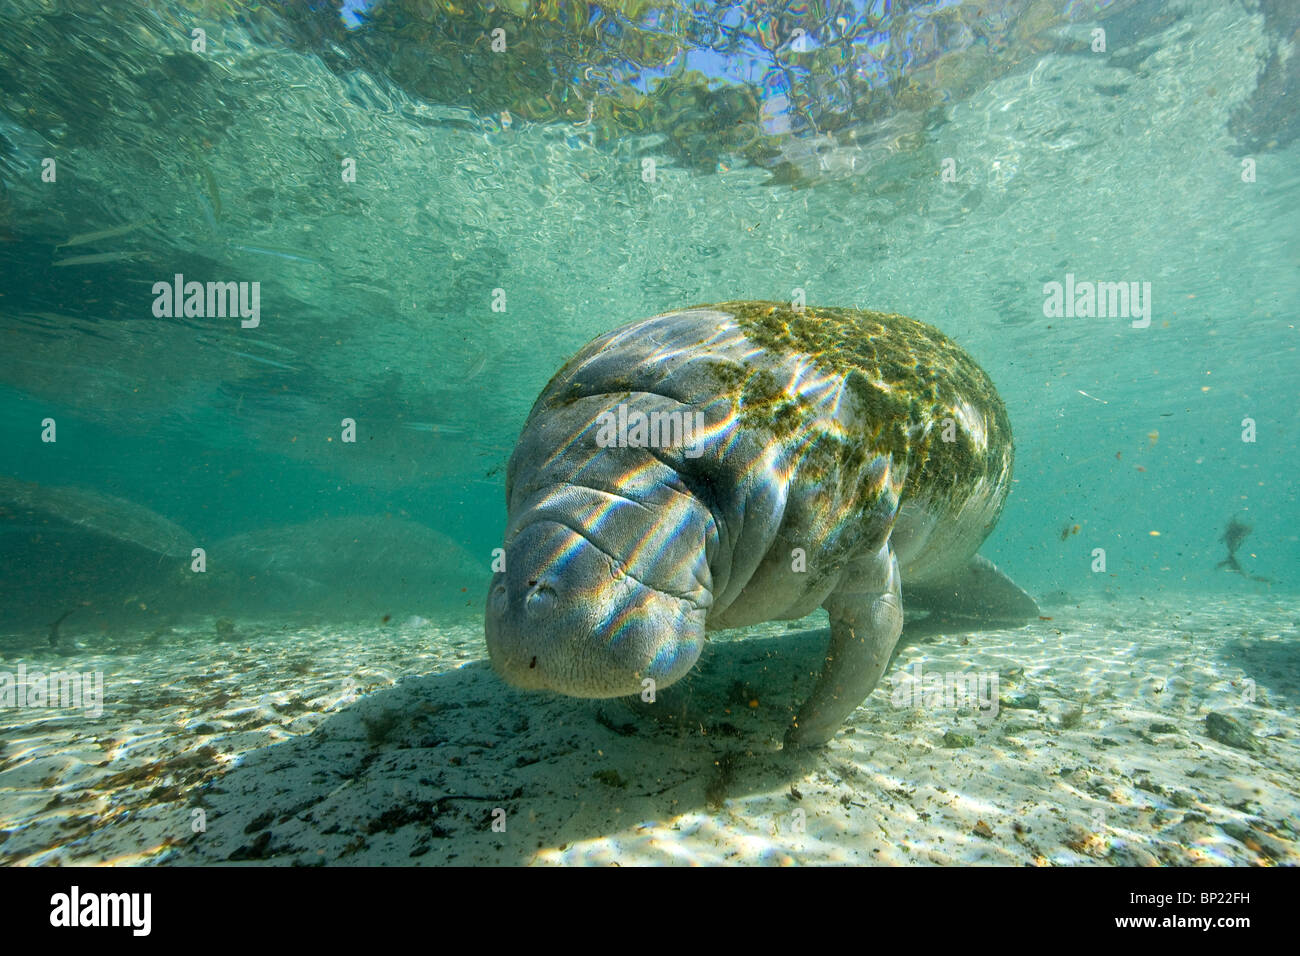 Manatee, Trichechus manatus latriostris, Crystal River, Florida, USA - Stock Image